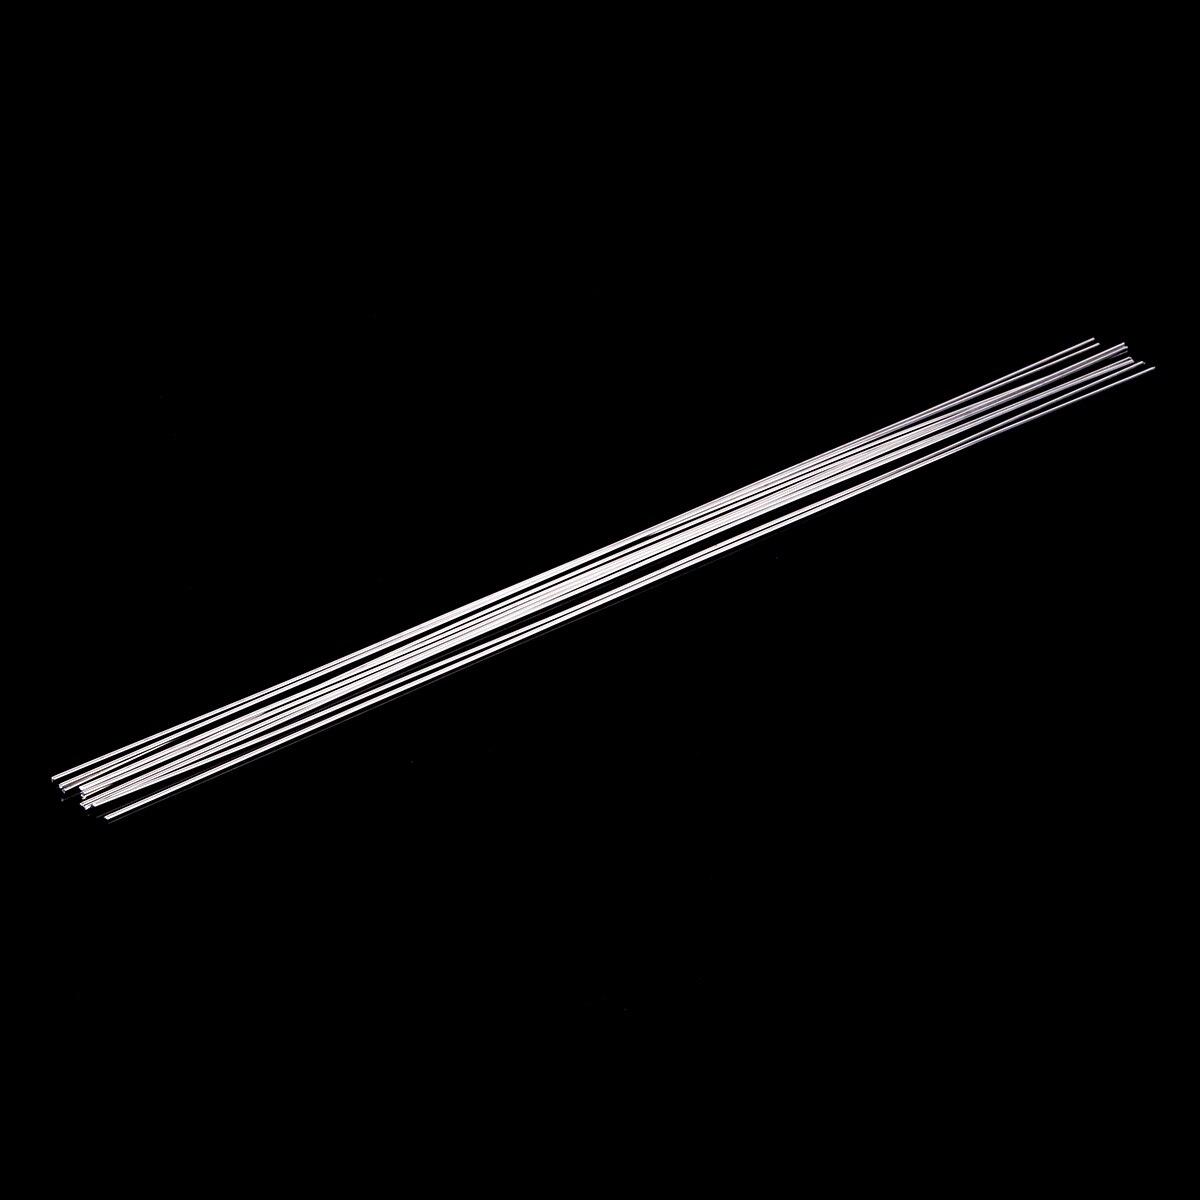 Easy Melt Welding Rods 10pcs 1.6mmx450mm